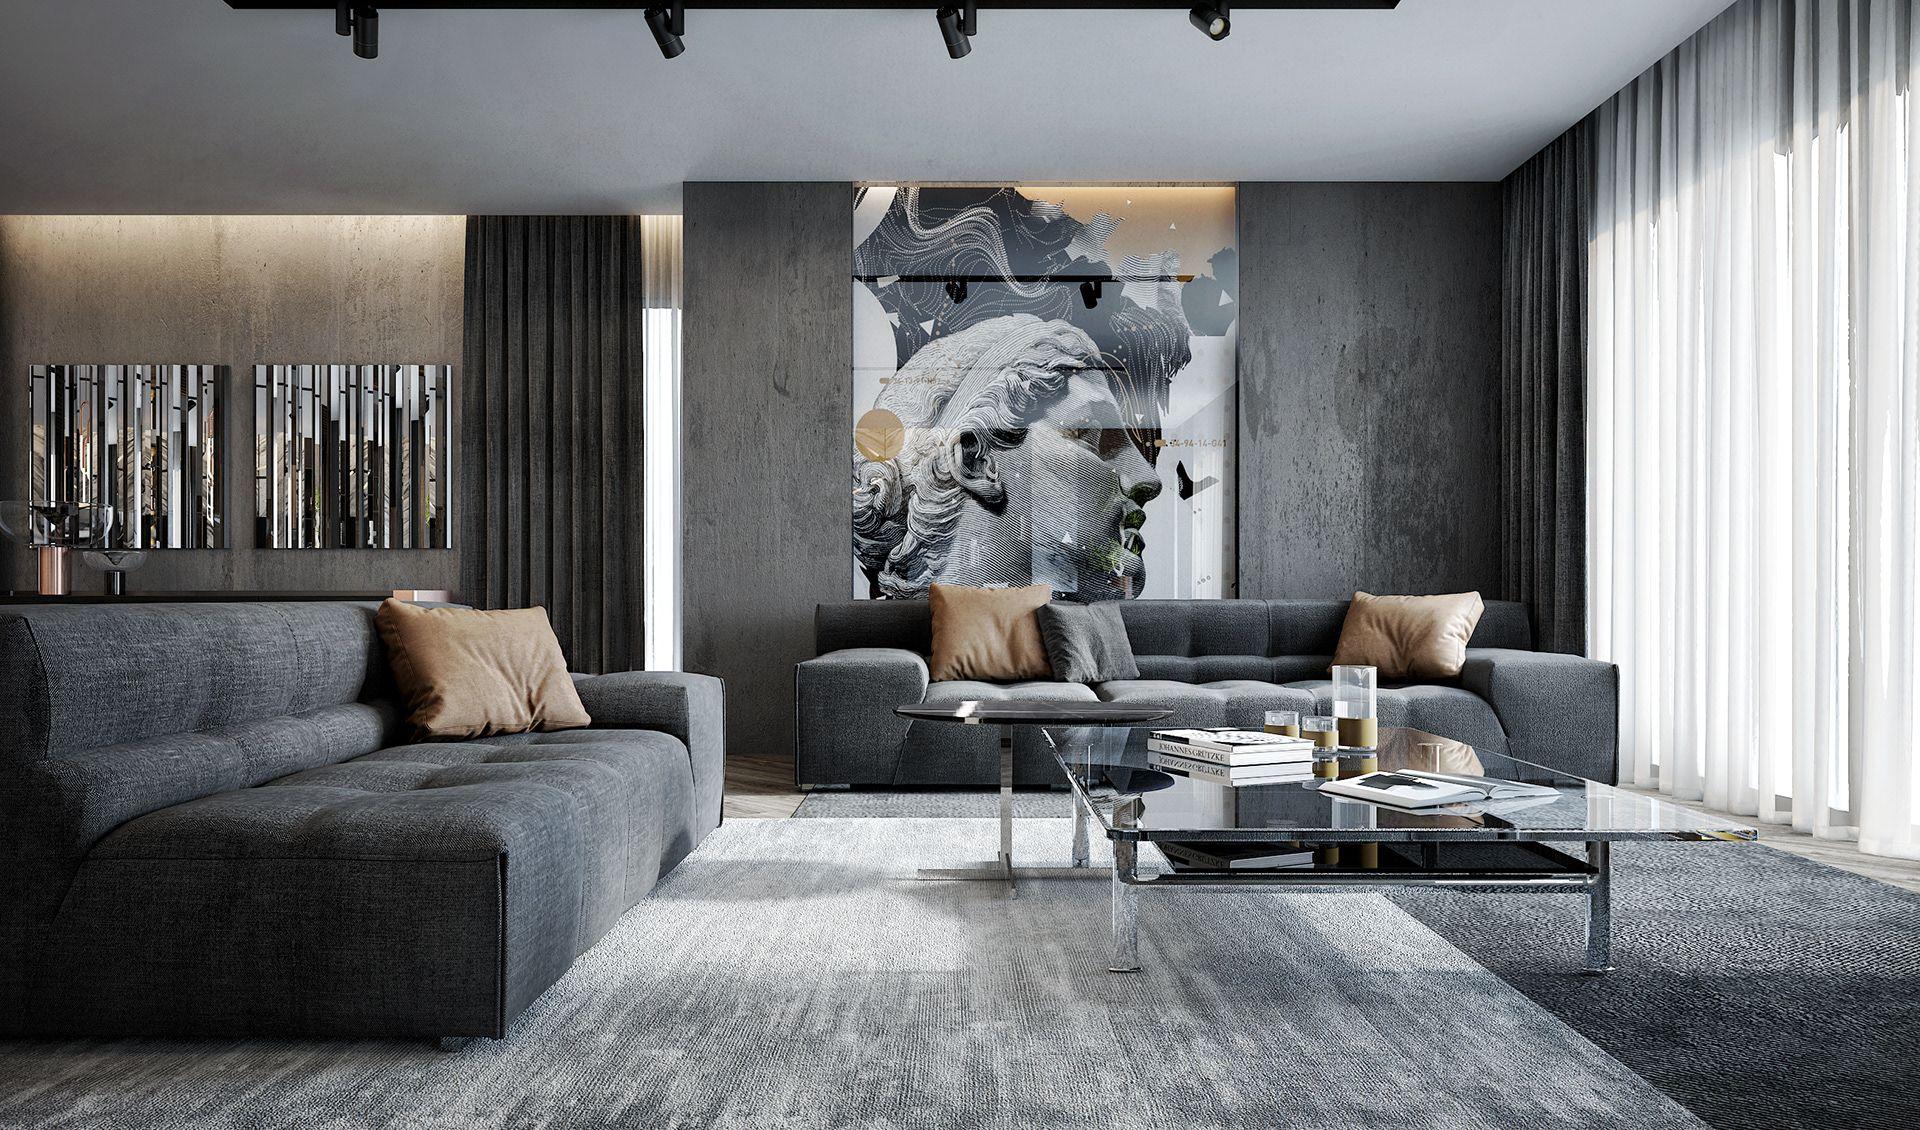 Luxury Apartment On Behance Luxury Apartments Interior Luxury Living Room Design Living Room Design Modern